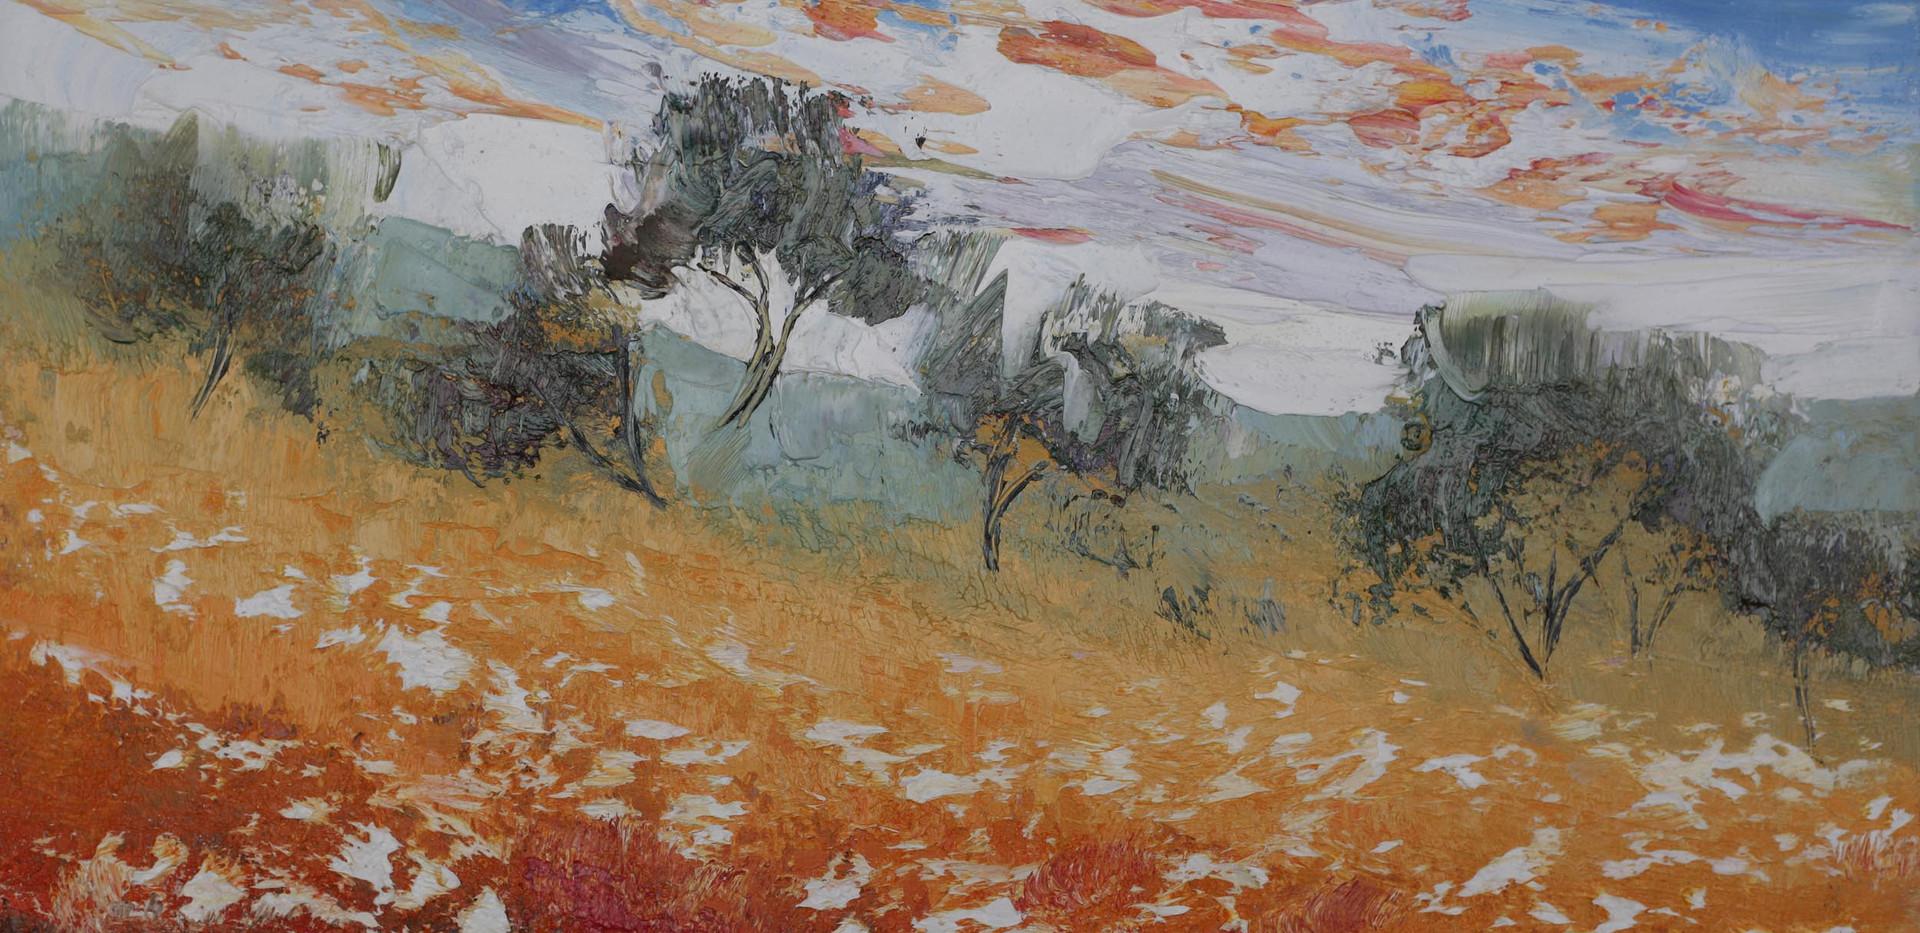 Outback Sienna 41cm x 30cm